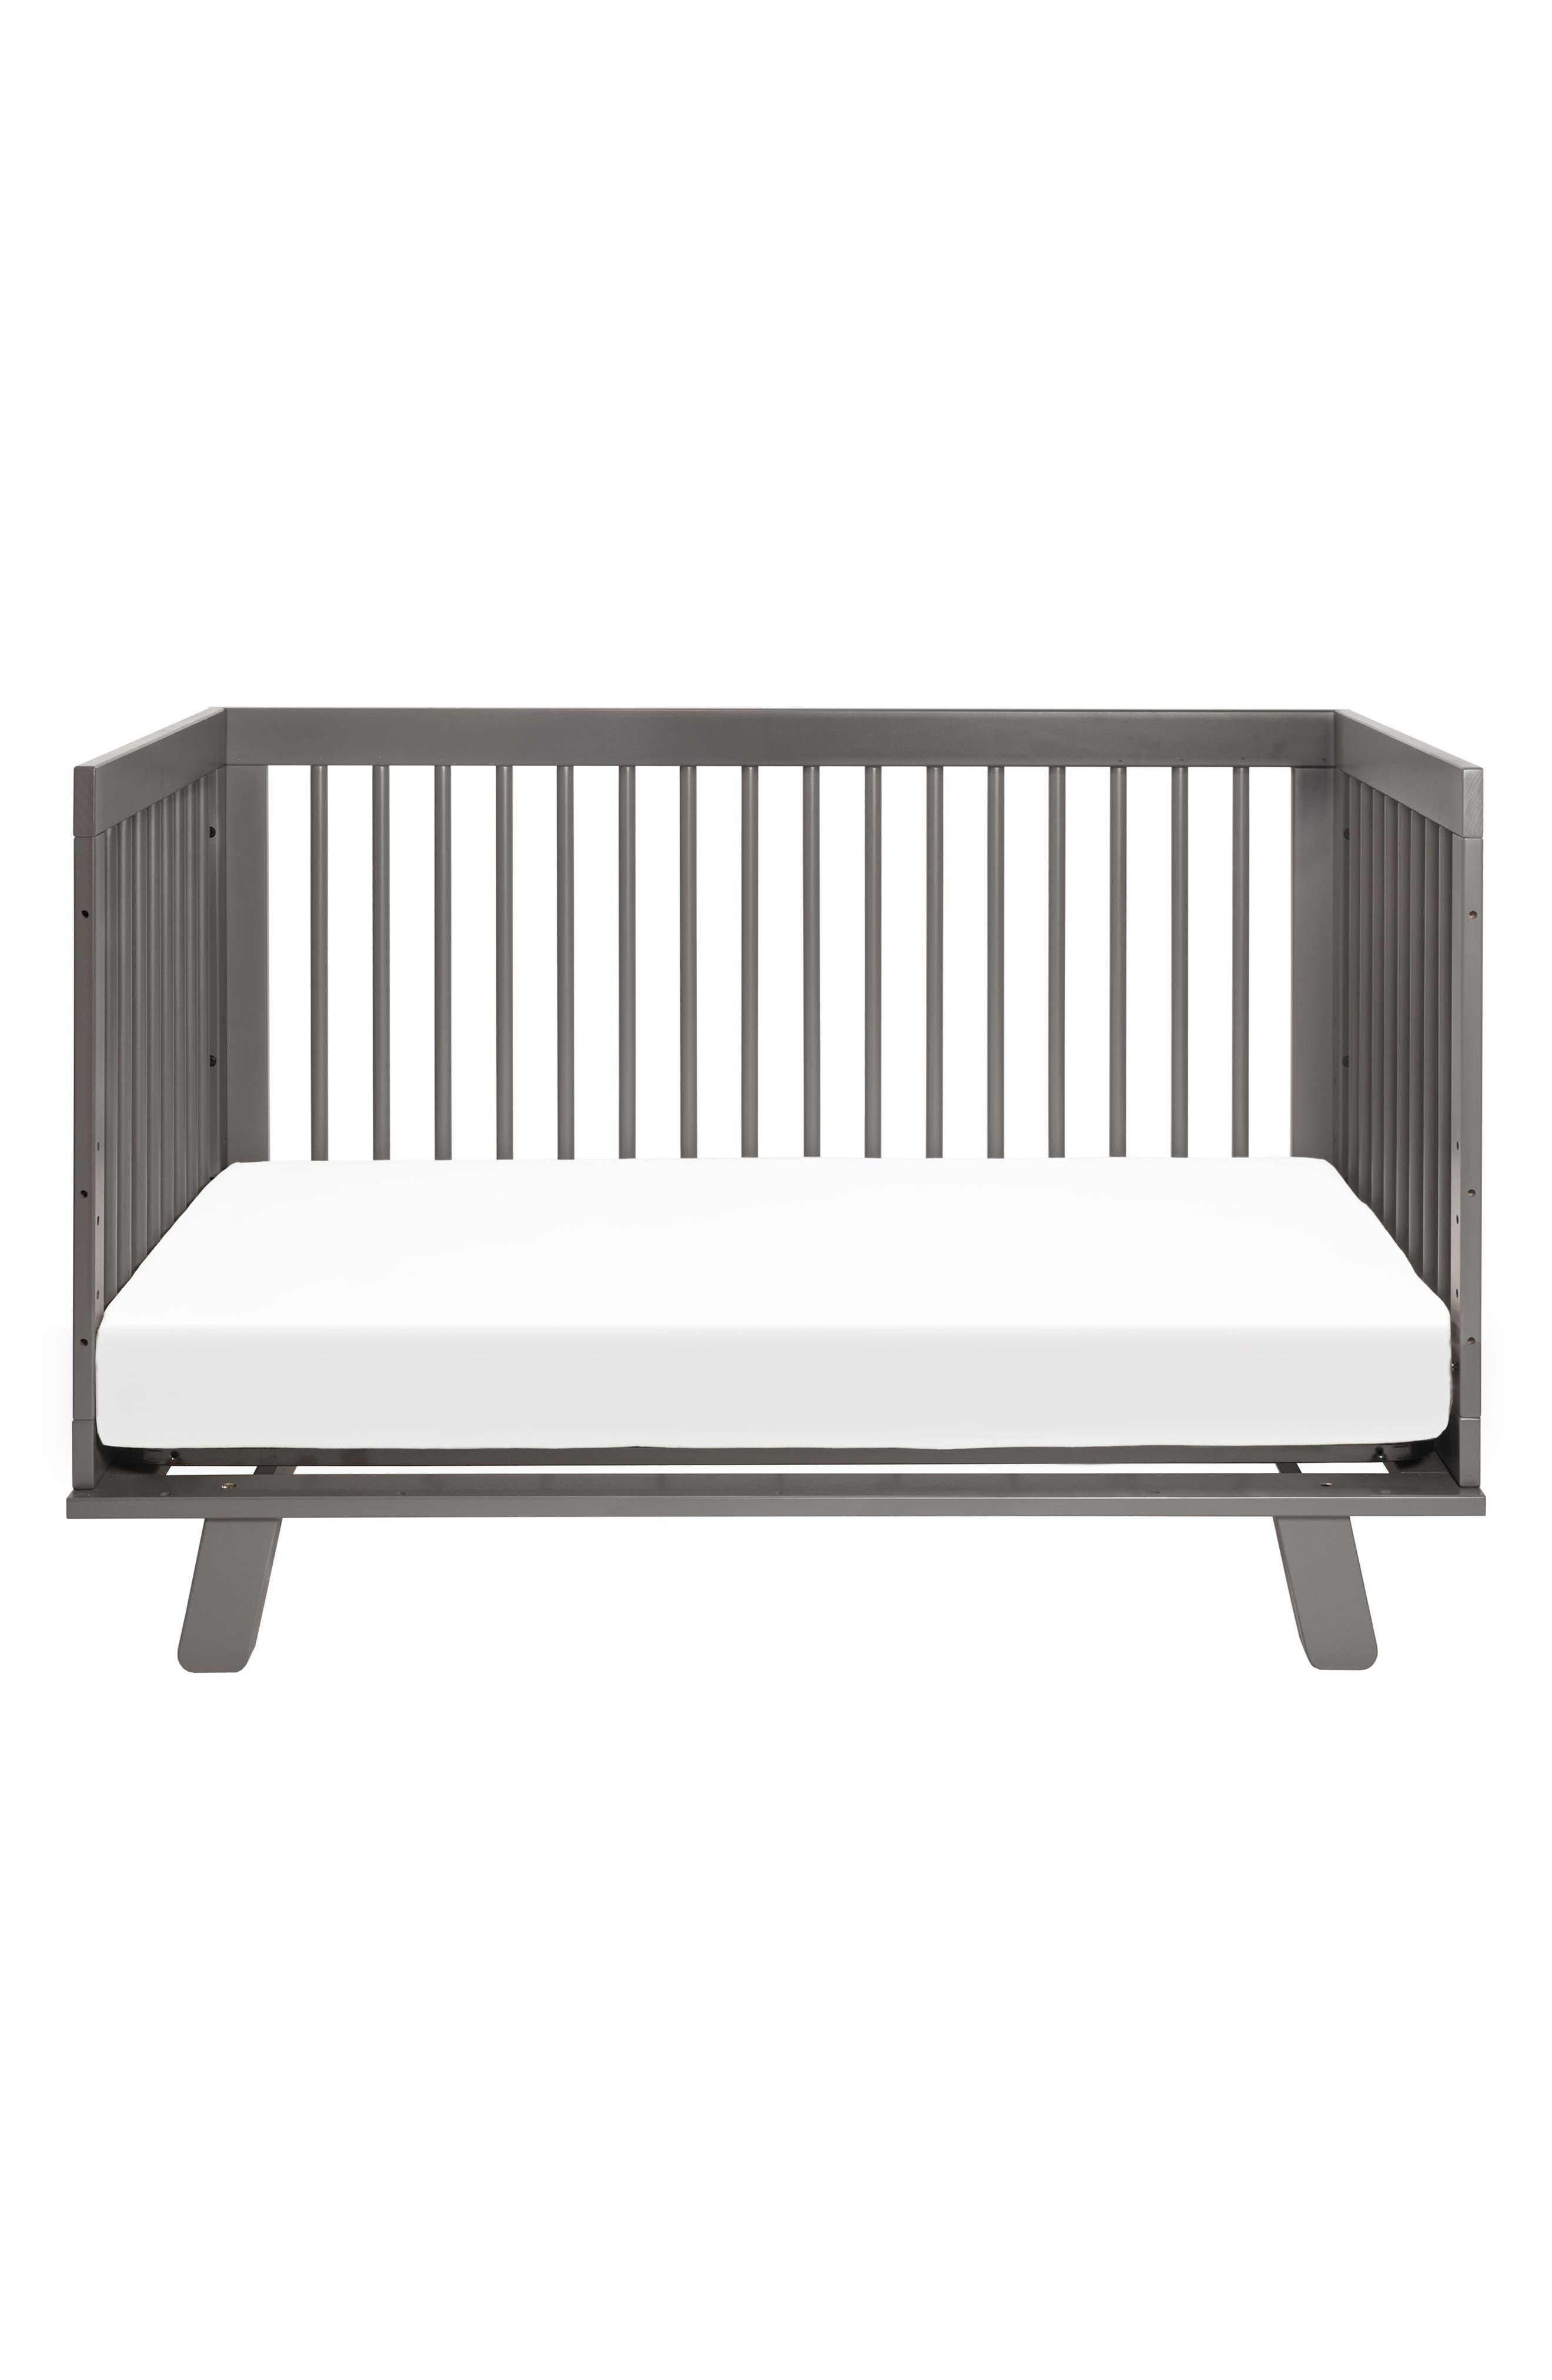 'Hudson' 3-in-1 Convertible Crib,                             Alternate thumbnail 5, color,                             021